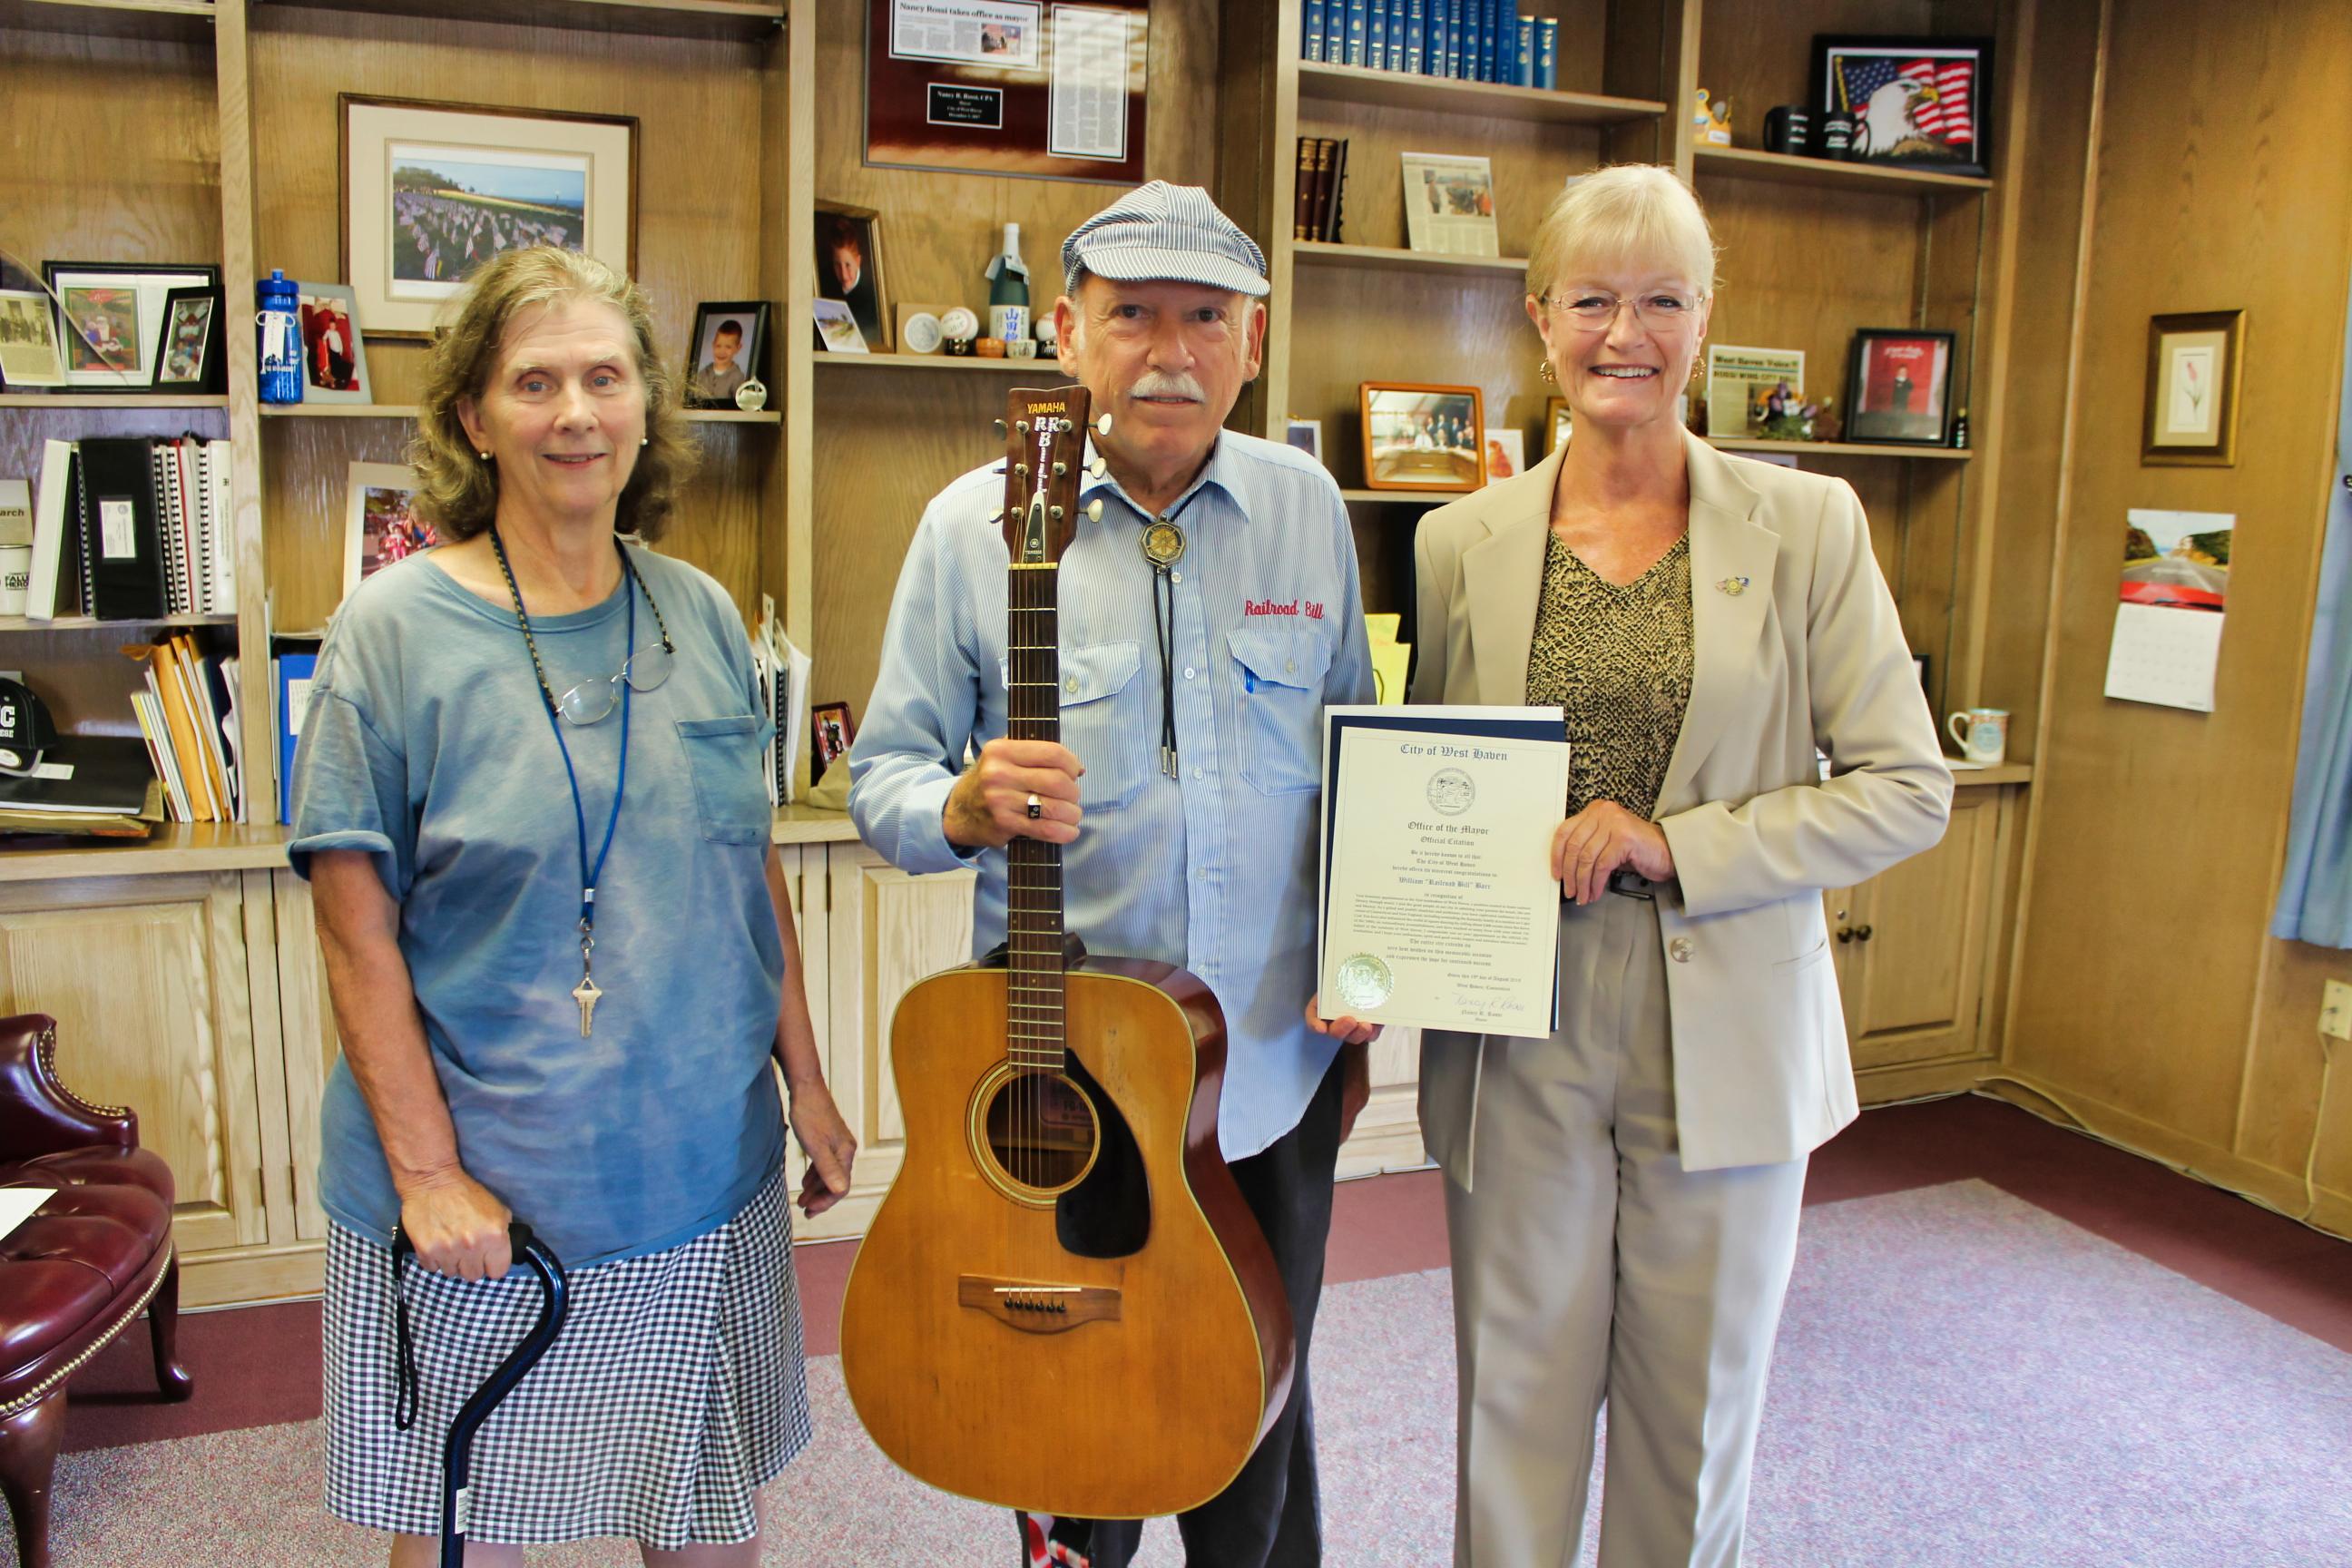 Barr named first troubadour